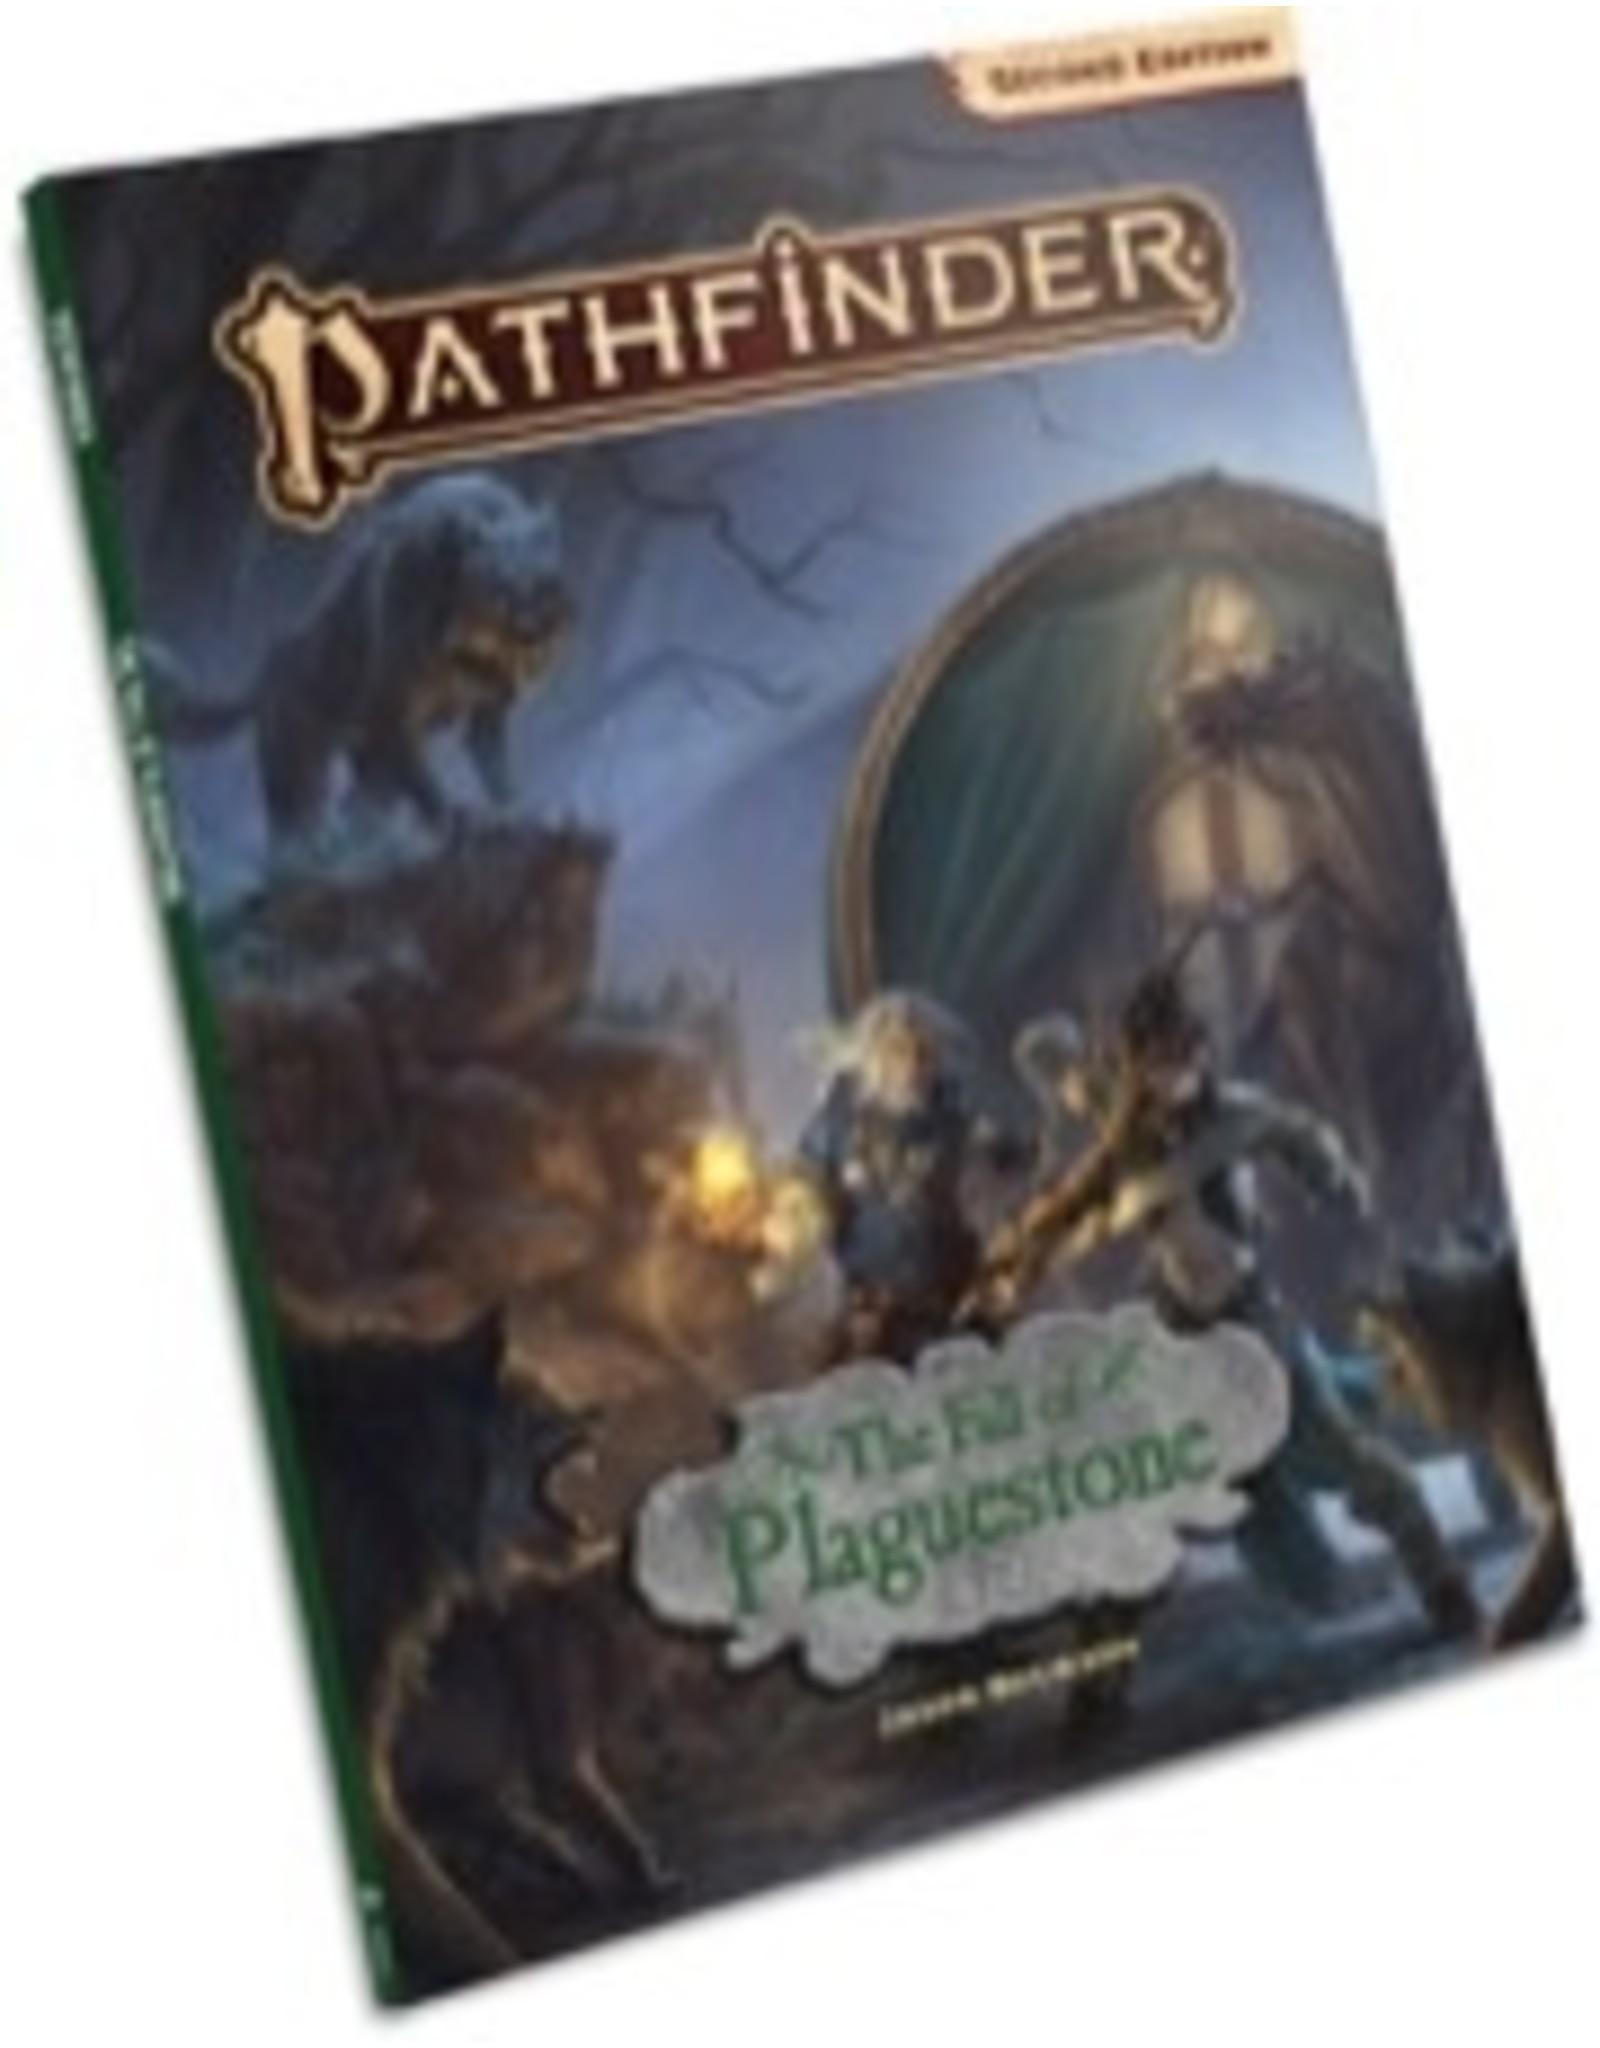 Pathfinder 2E: The Fall of Plaguestone